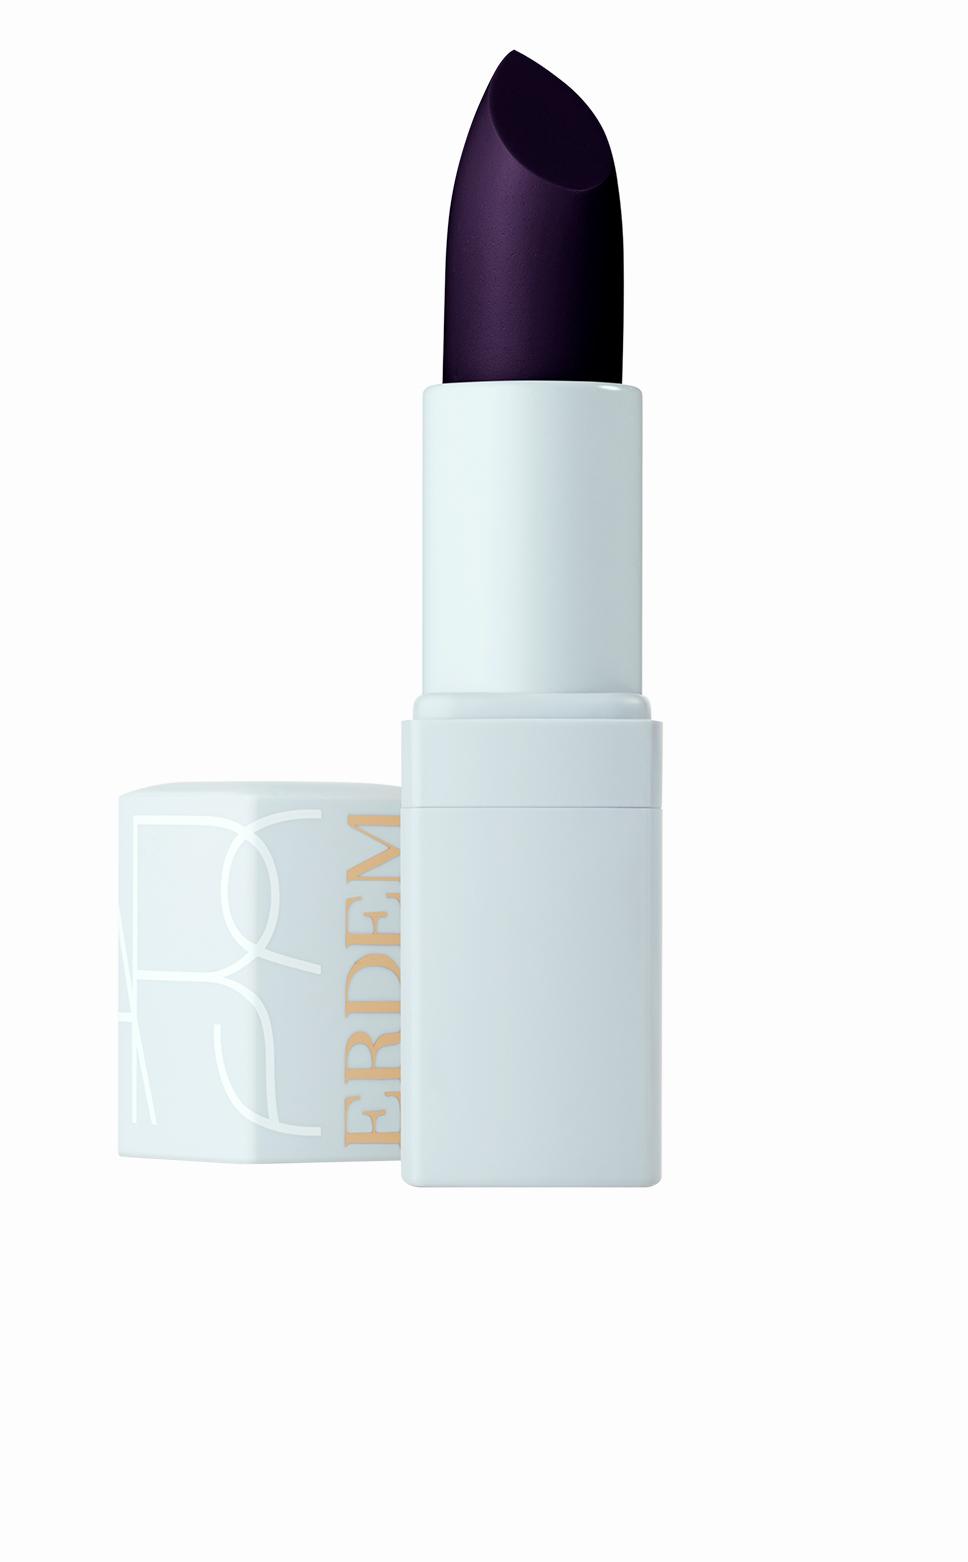 mỹ phẩm giới hạn Wildflower Lipstick